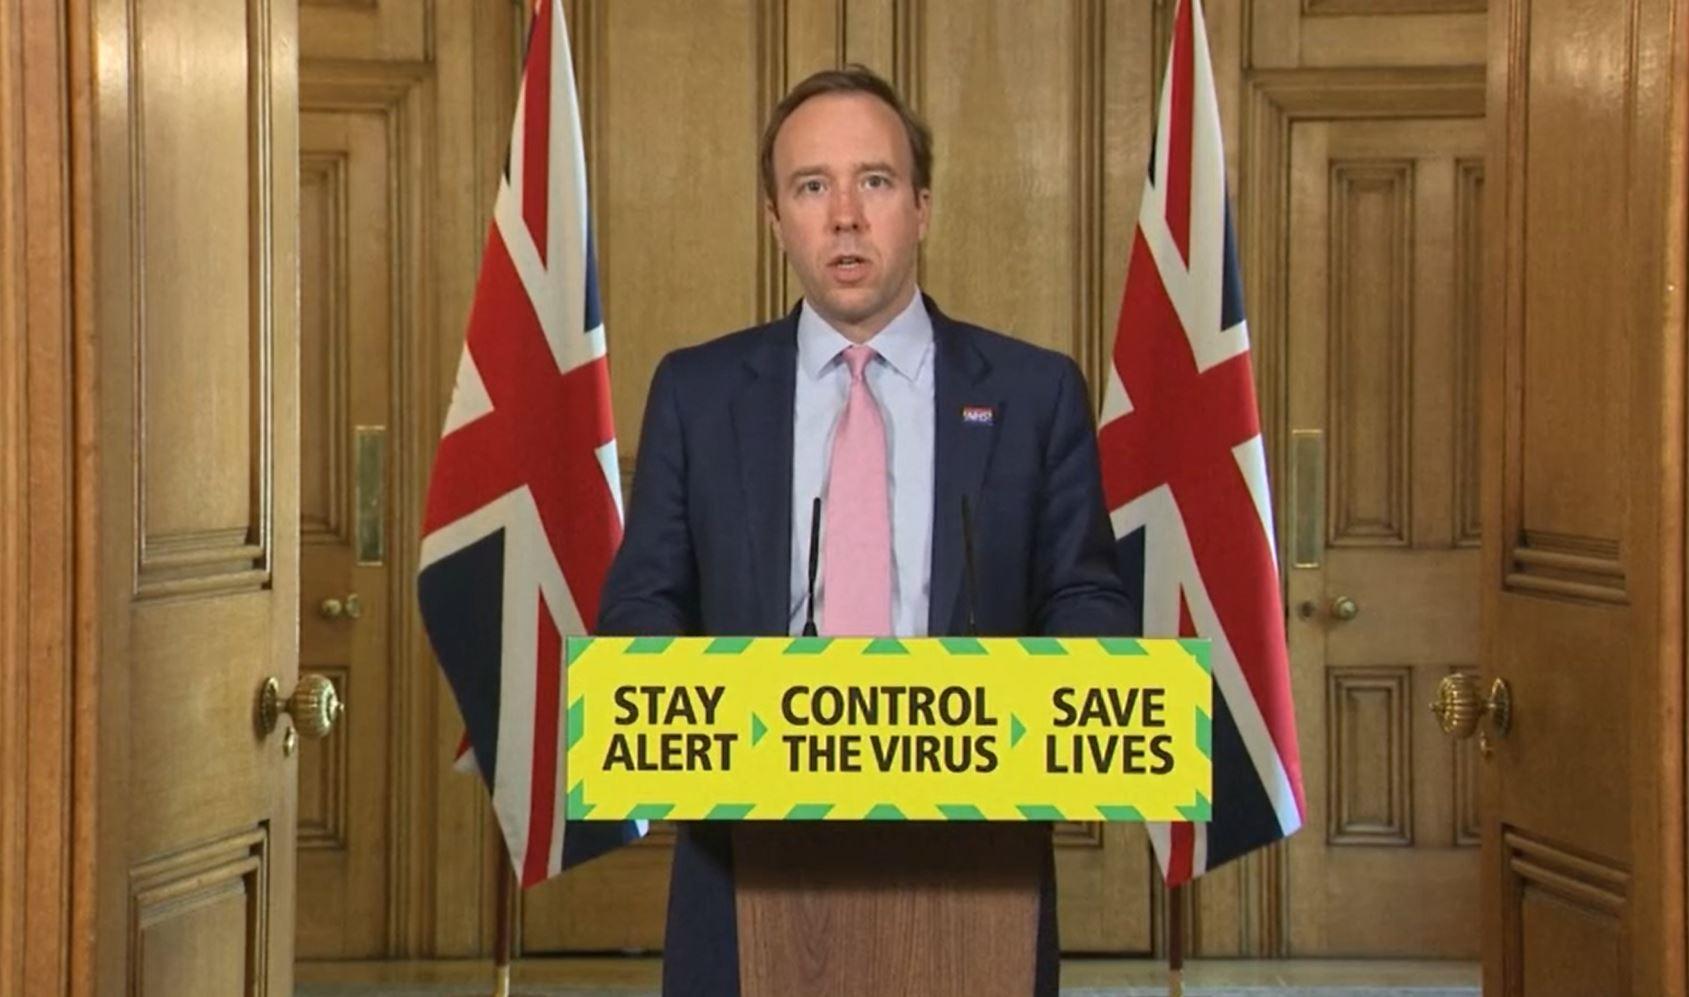 Health and Social Care Secretary Matt Hancock during a media briefing in Downing Street, London, on coronavirus (COVID-19).